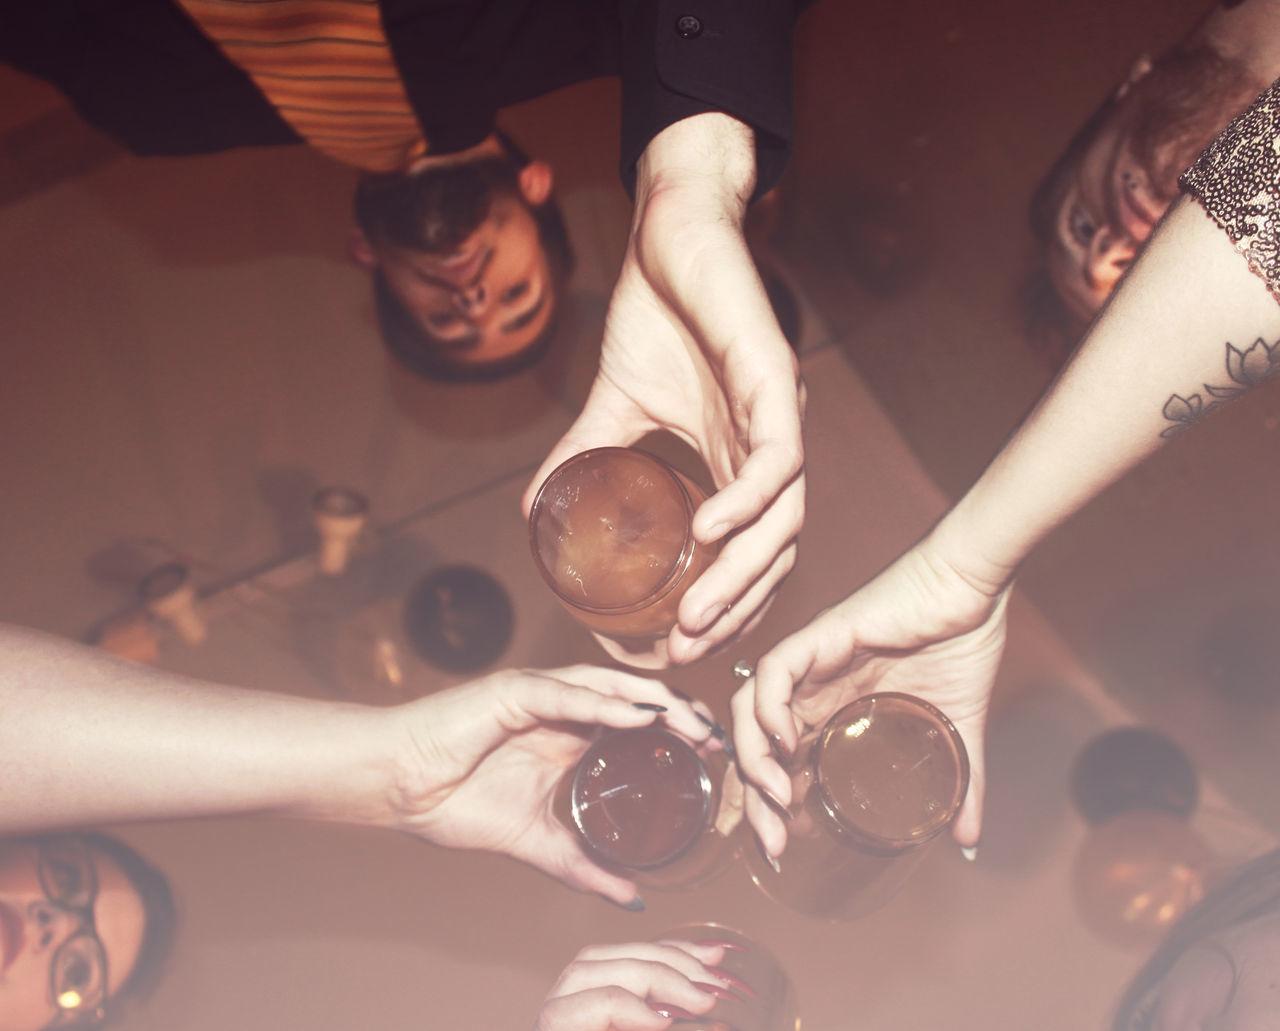 Happy Hour Drink NYE Cheers First Eyeem Photo